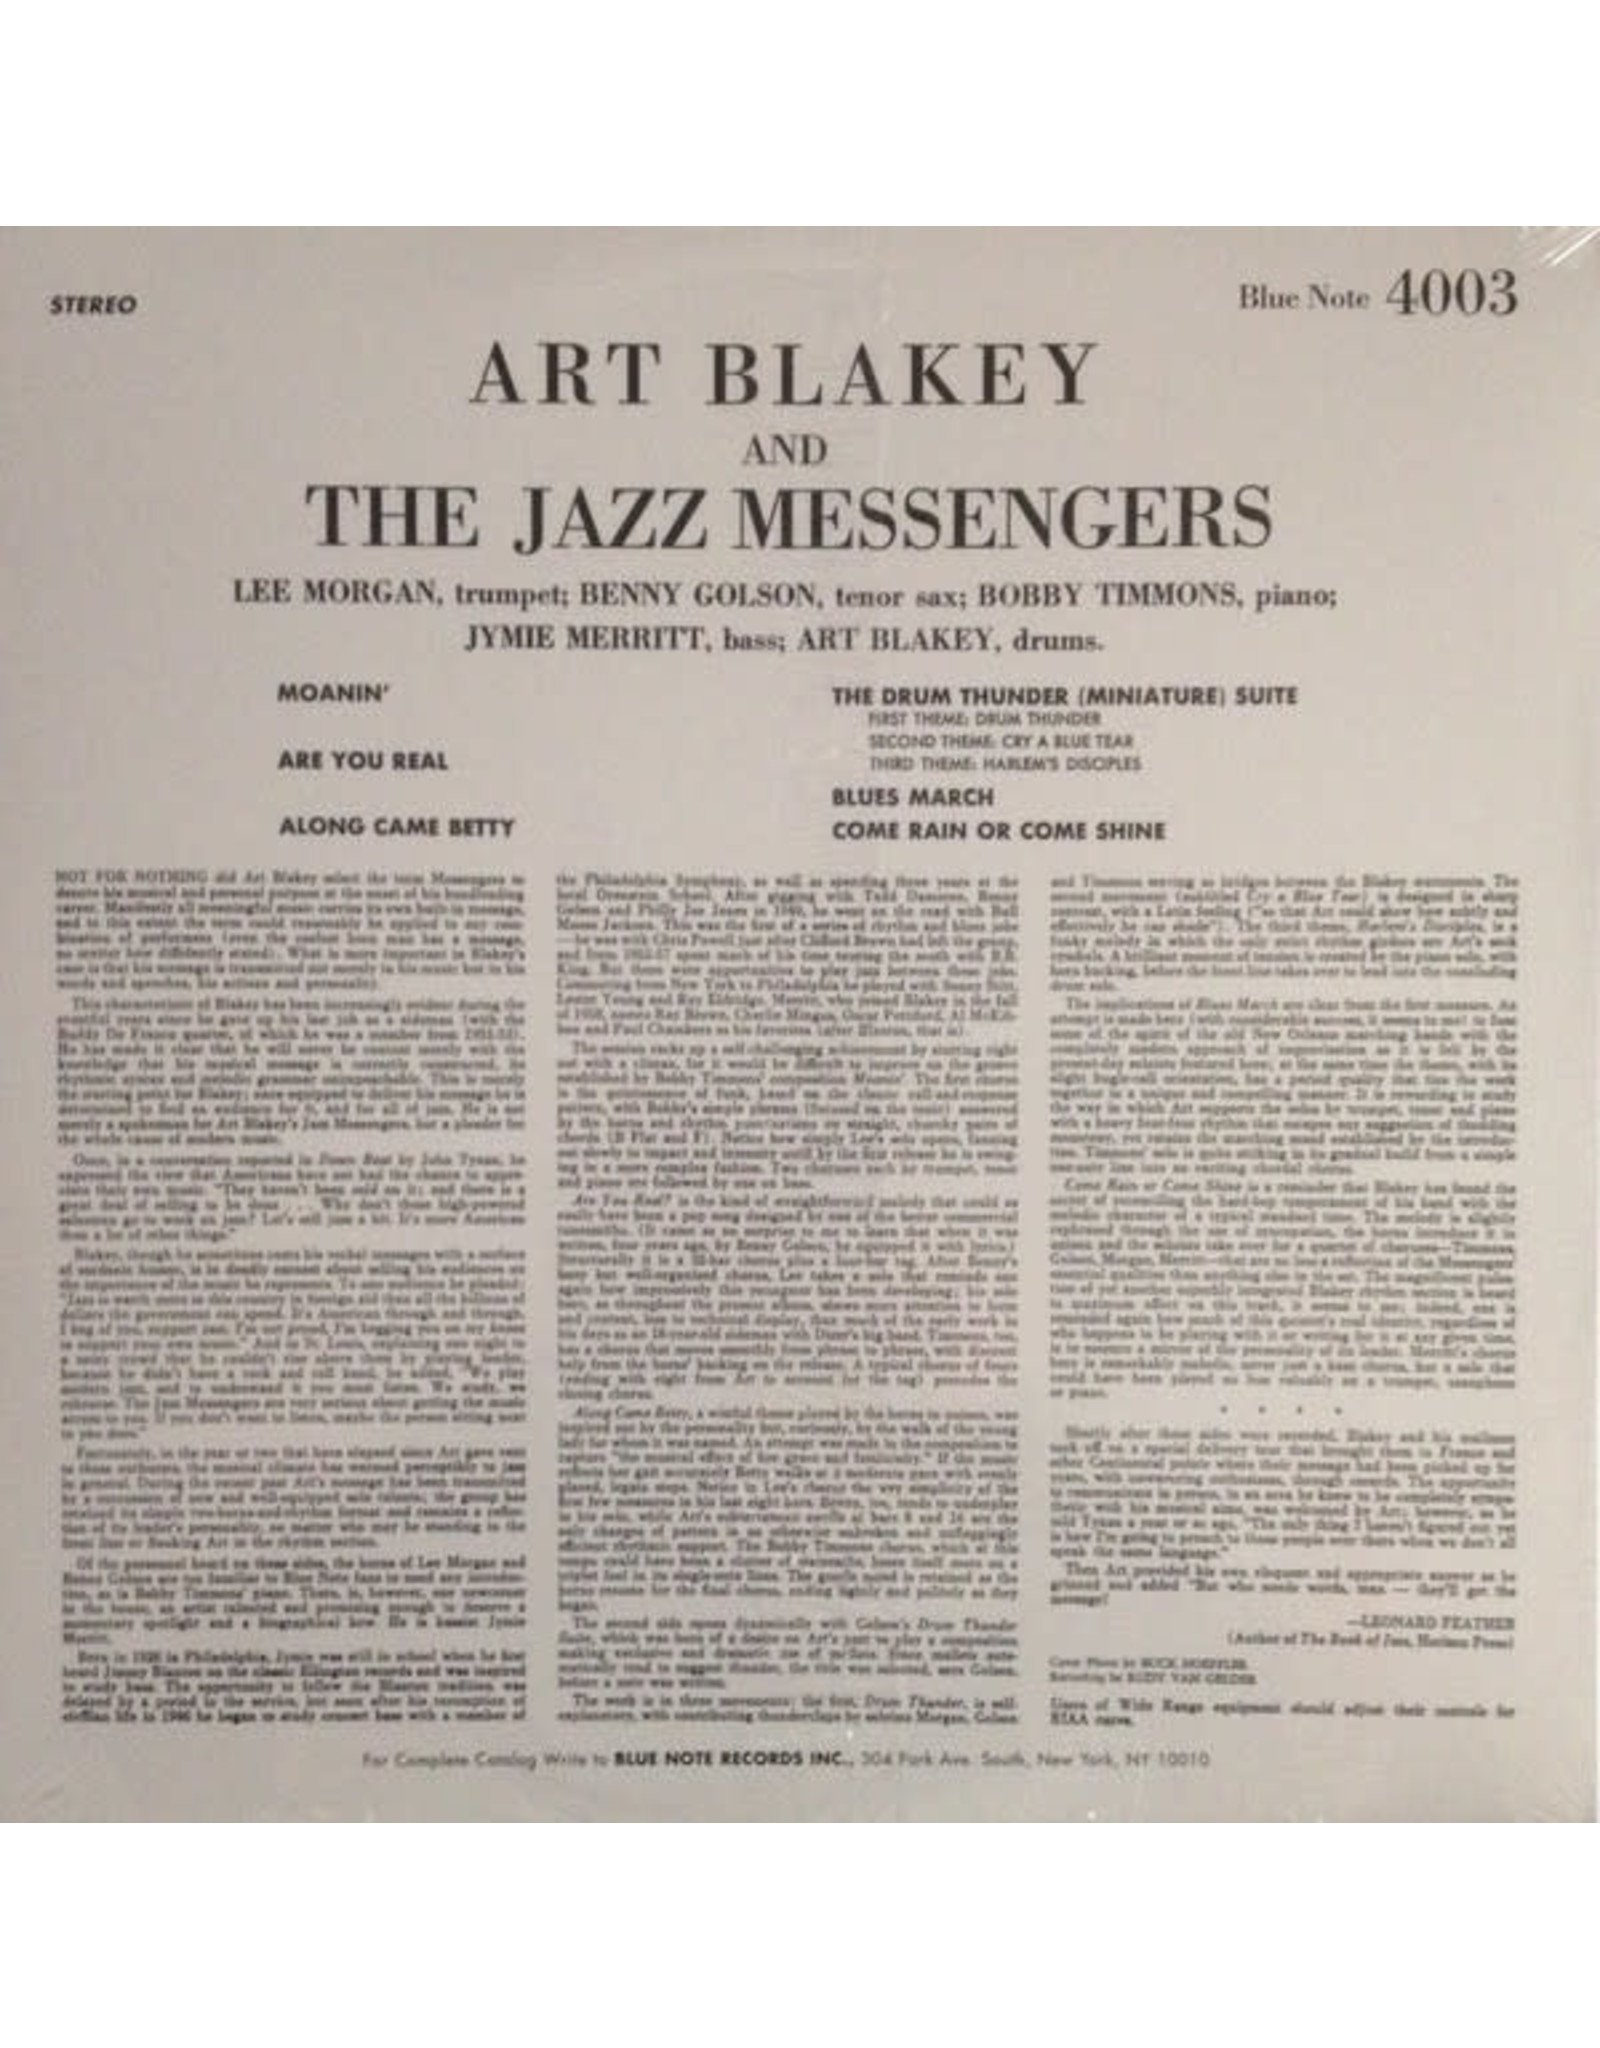 Art Blakey - Moanin'